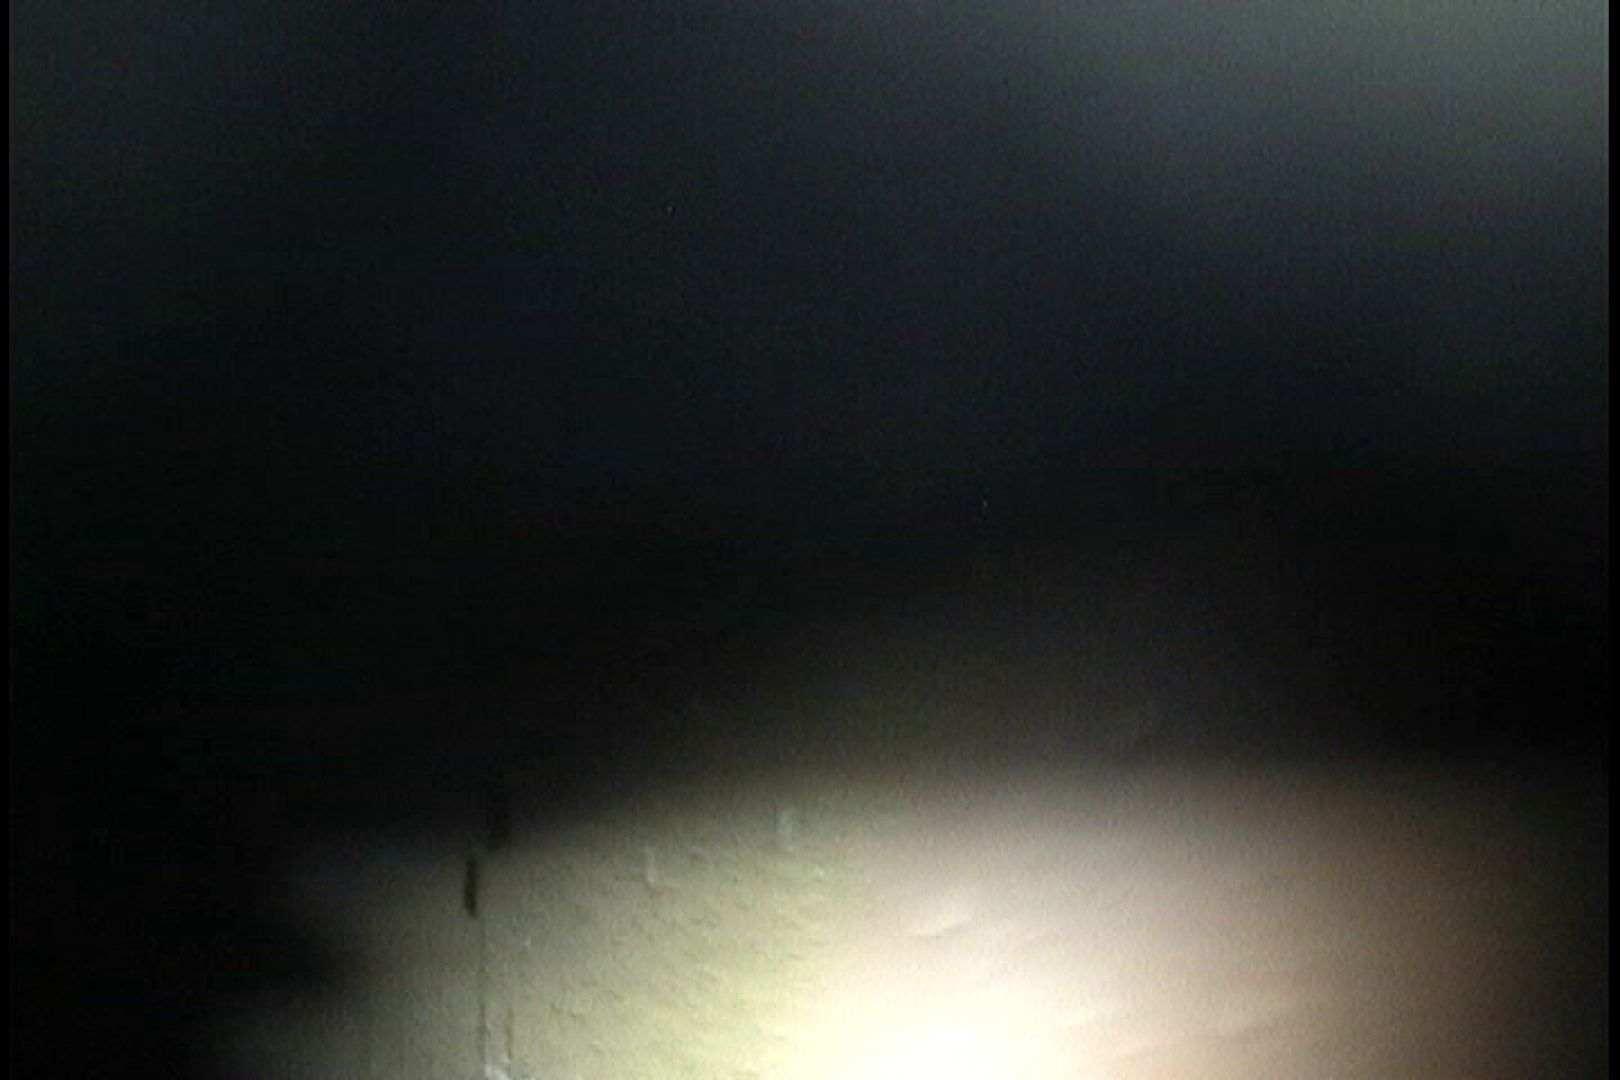 No.41 陰茎から滴り落ちる水滴 ギャルズ オマンコ無修正動画無料 86画像 72